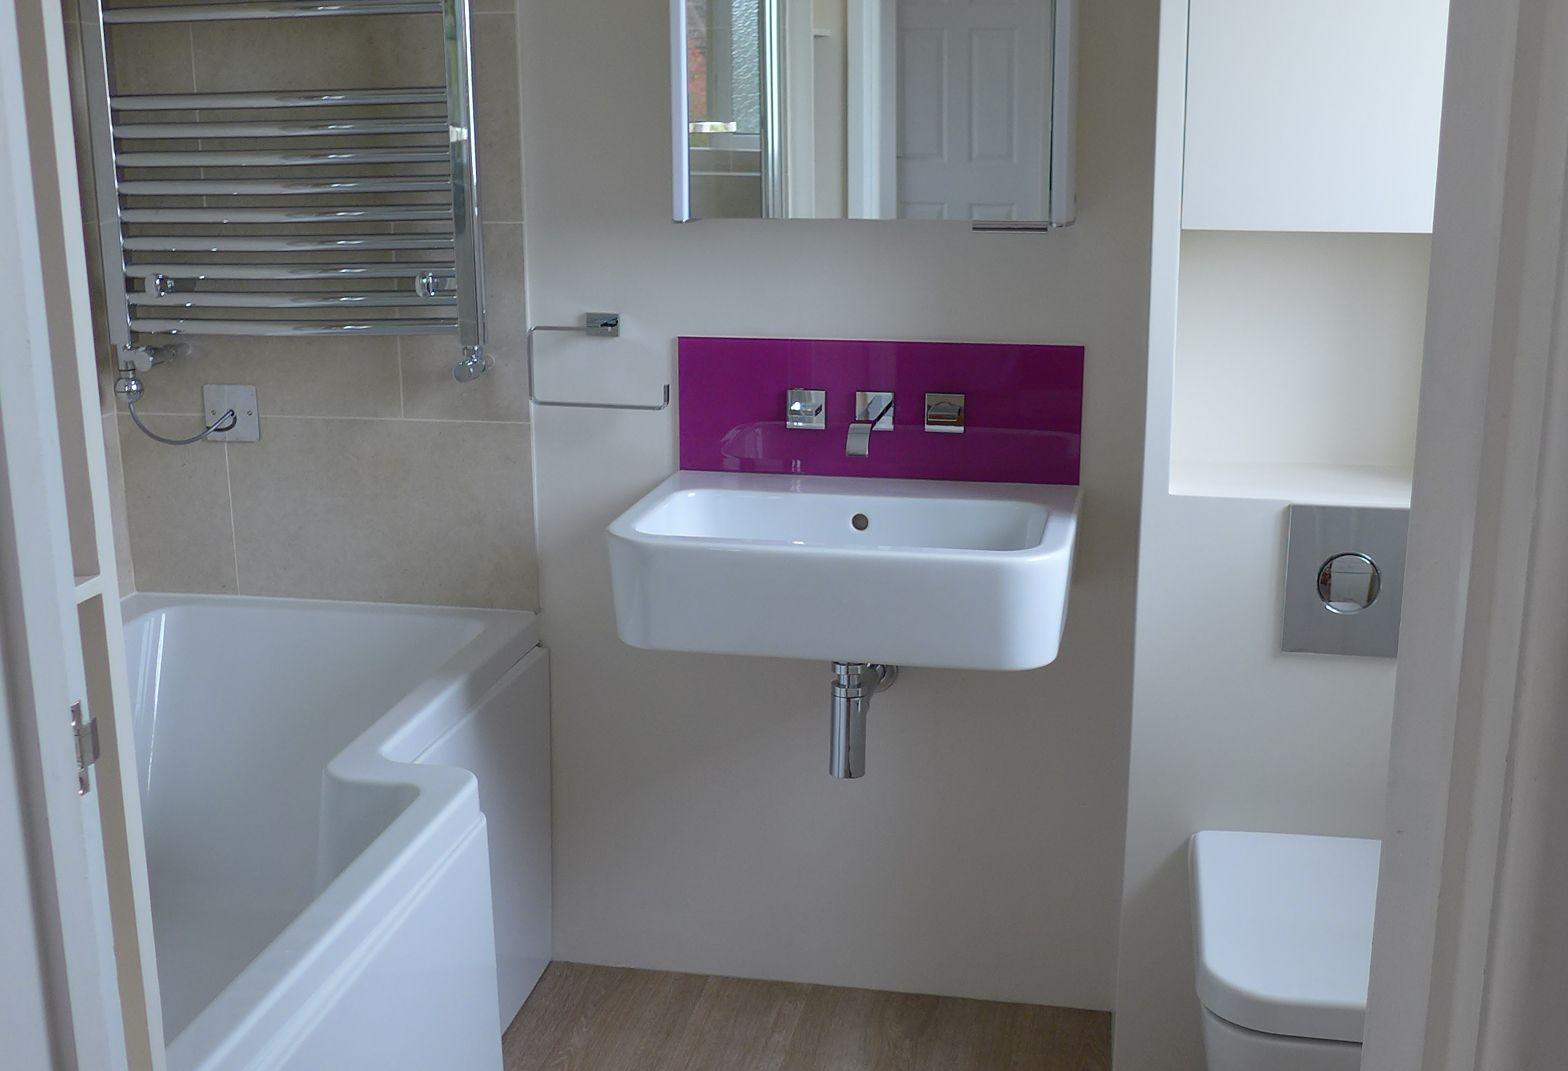 Glass splashbacks for bathroom sinks - Style Within